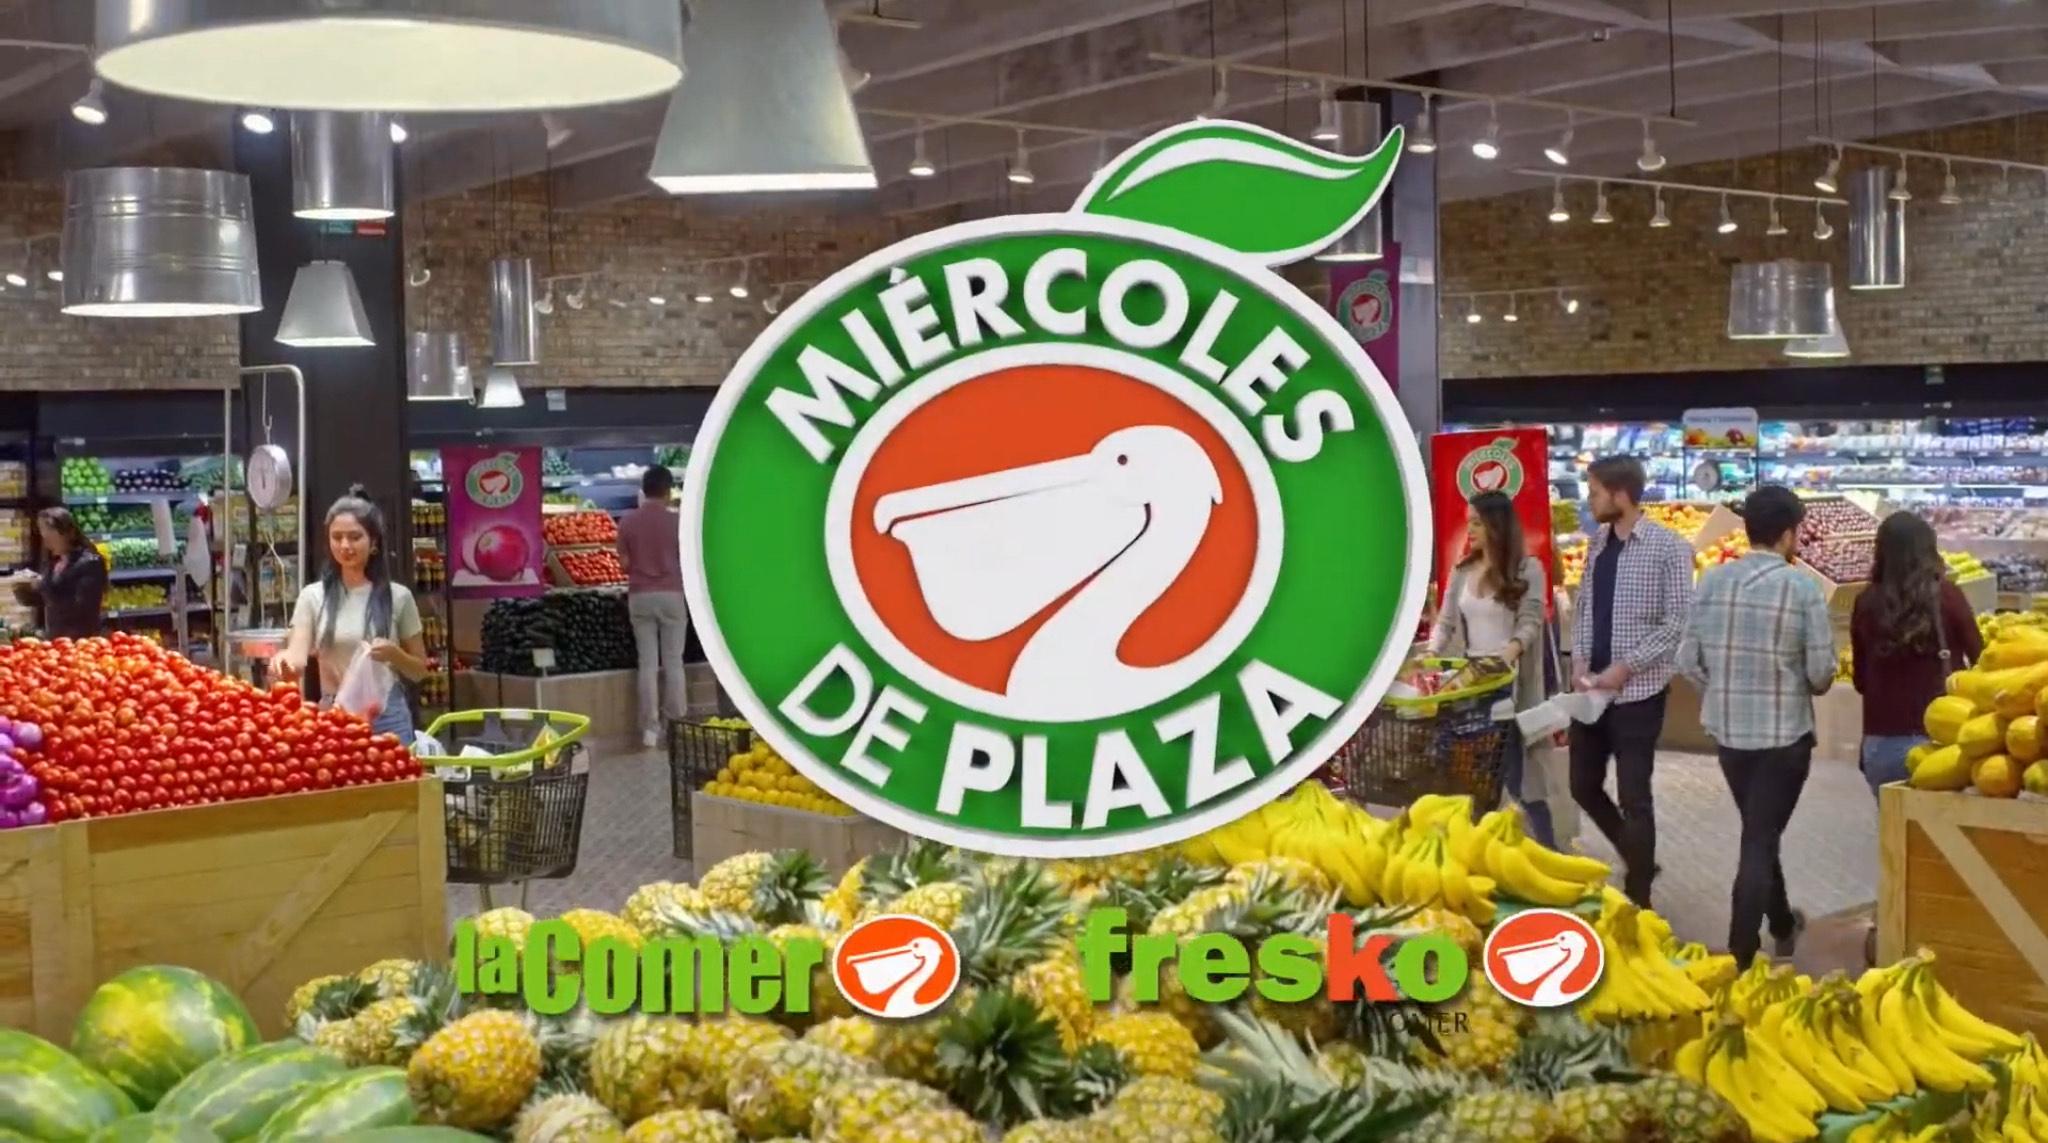 La Comer: Miércoles de Plaza 09 Septiembre | Piña Miel, Uva Red $19.90kg; Aguacate Hass, Pera D'Anjou $36.90kg y más...